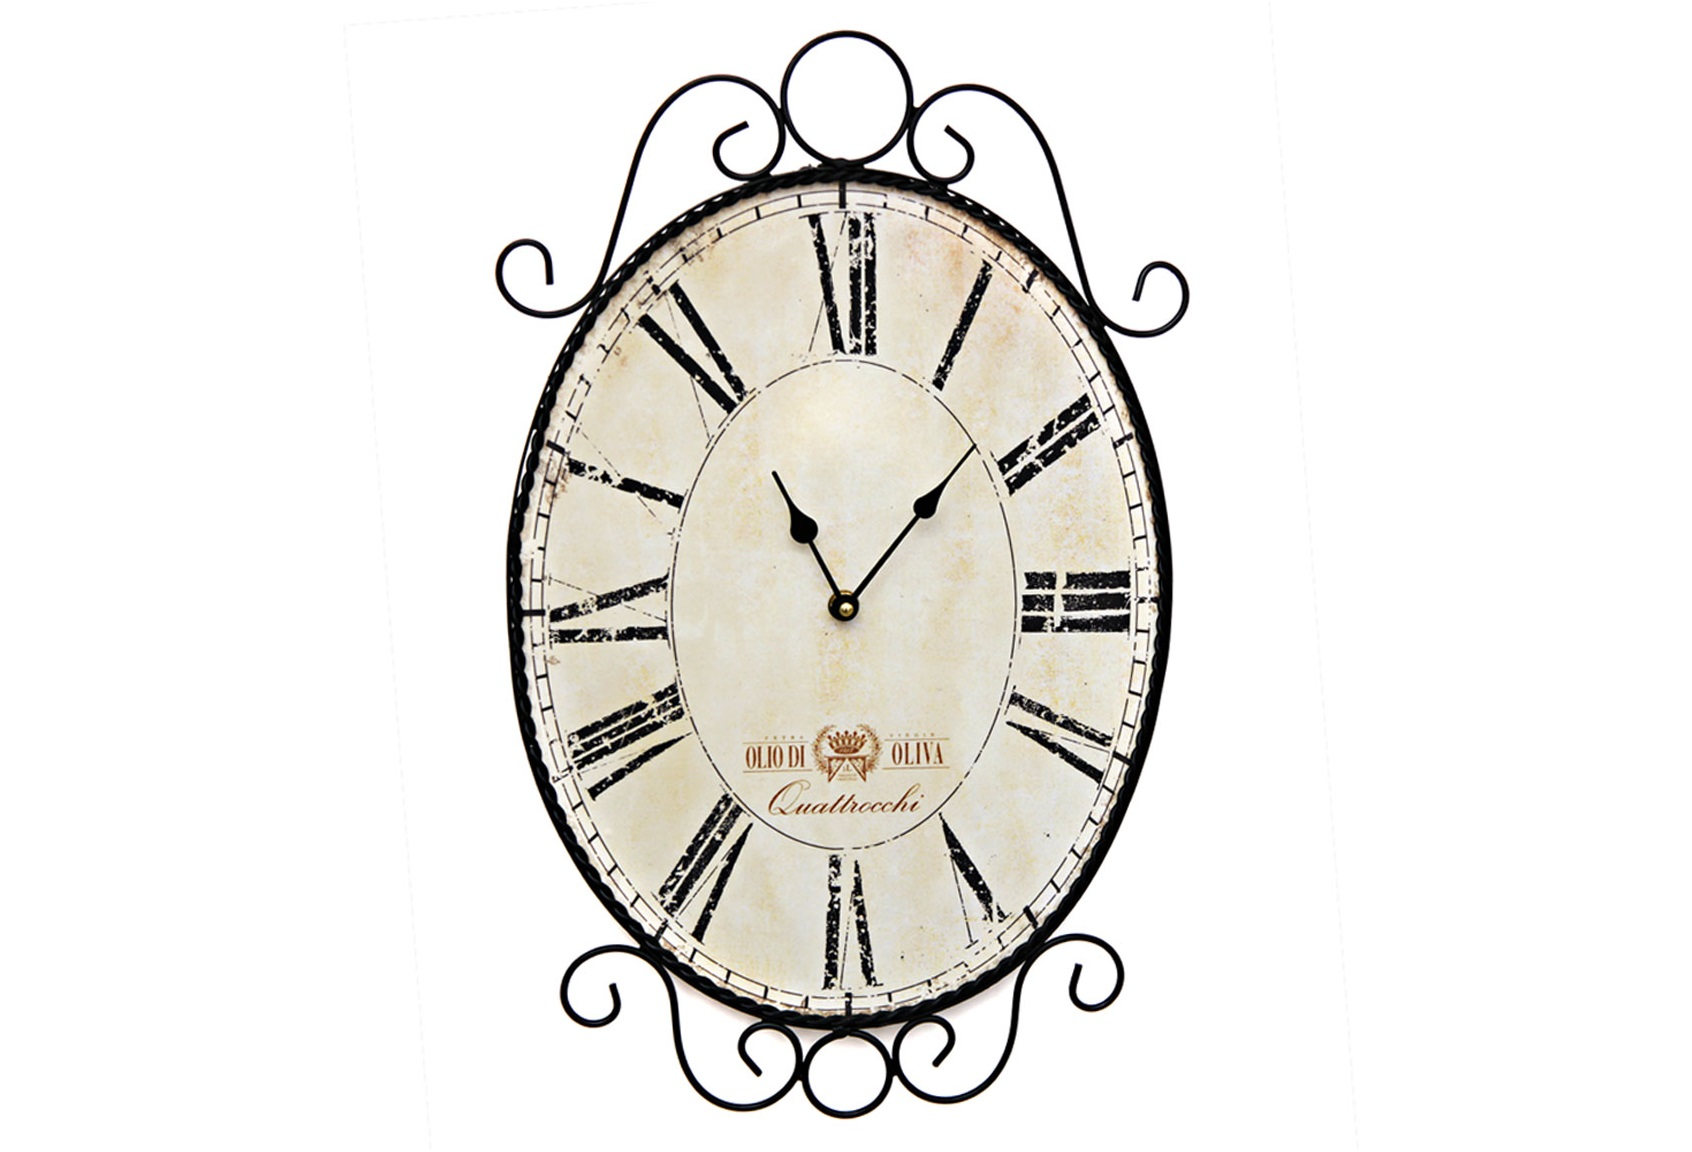 ЧасыНастенные часы<br>Кварцевый механизм<br><br>Material: Металл<br>Length см: None<br>Width см: 20<br>Depth см: 6<br>Height см: 38